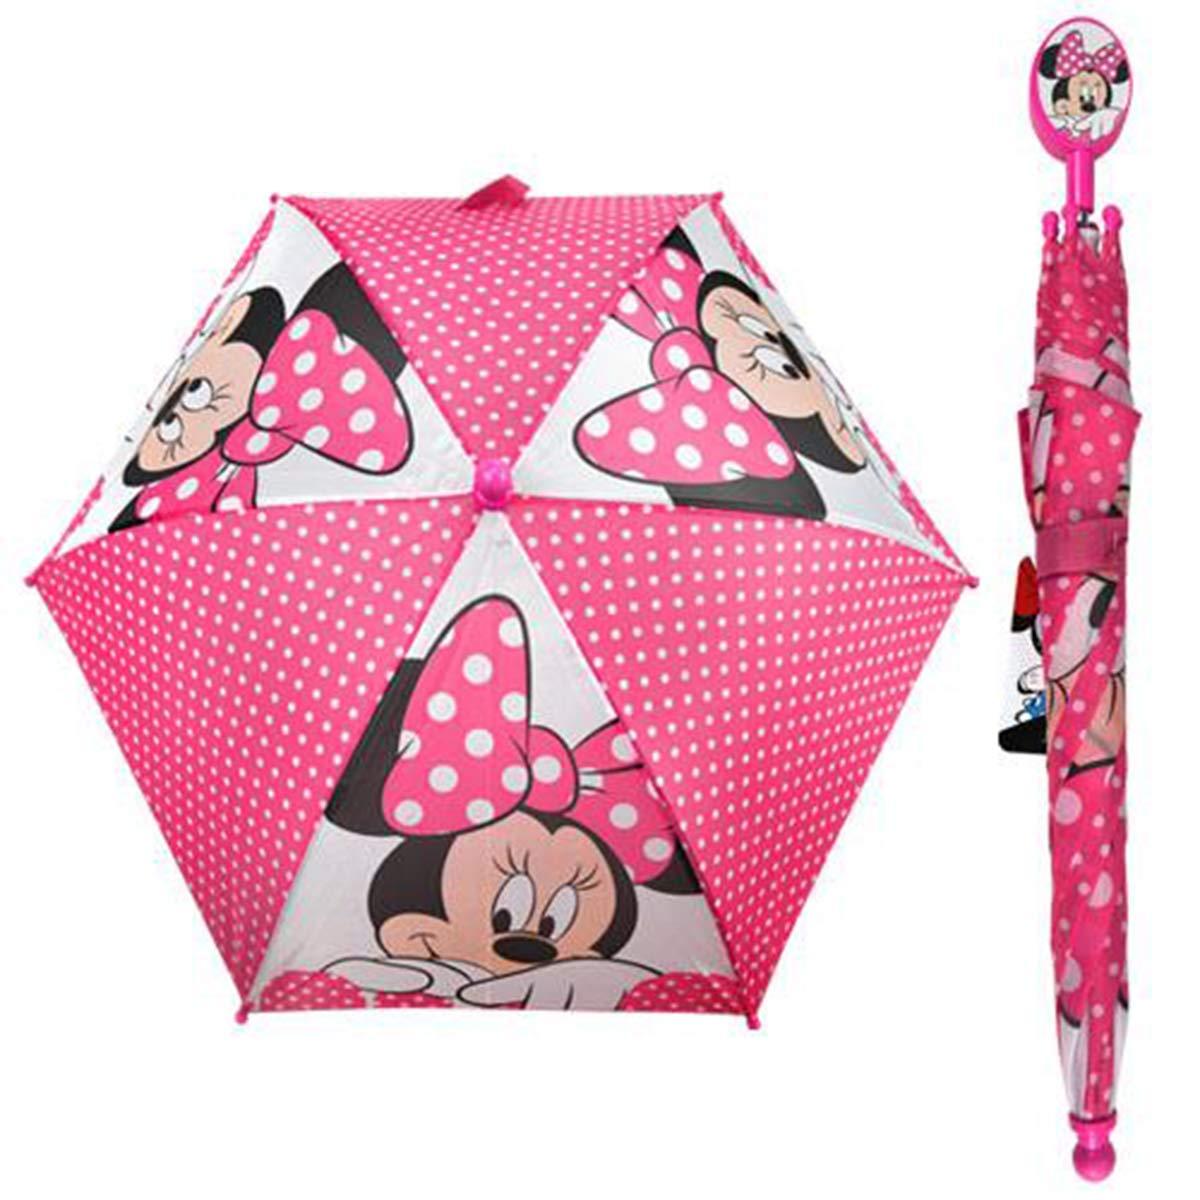 Disney Minnie Mouse Kids Umbrella Standard